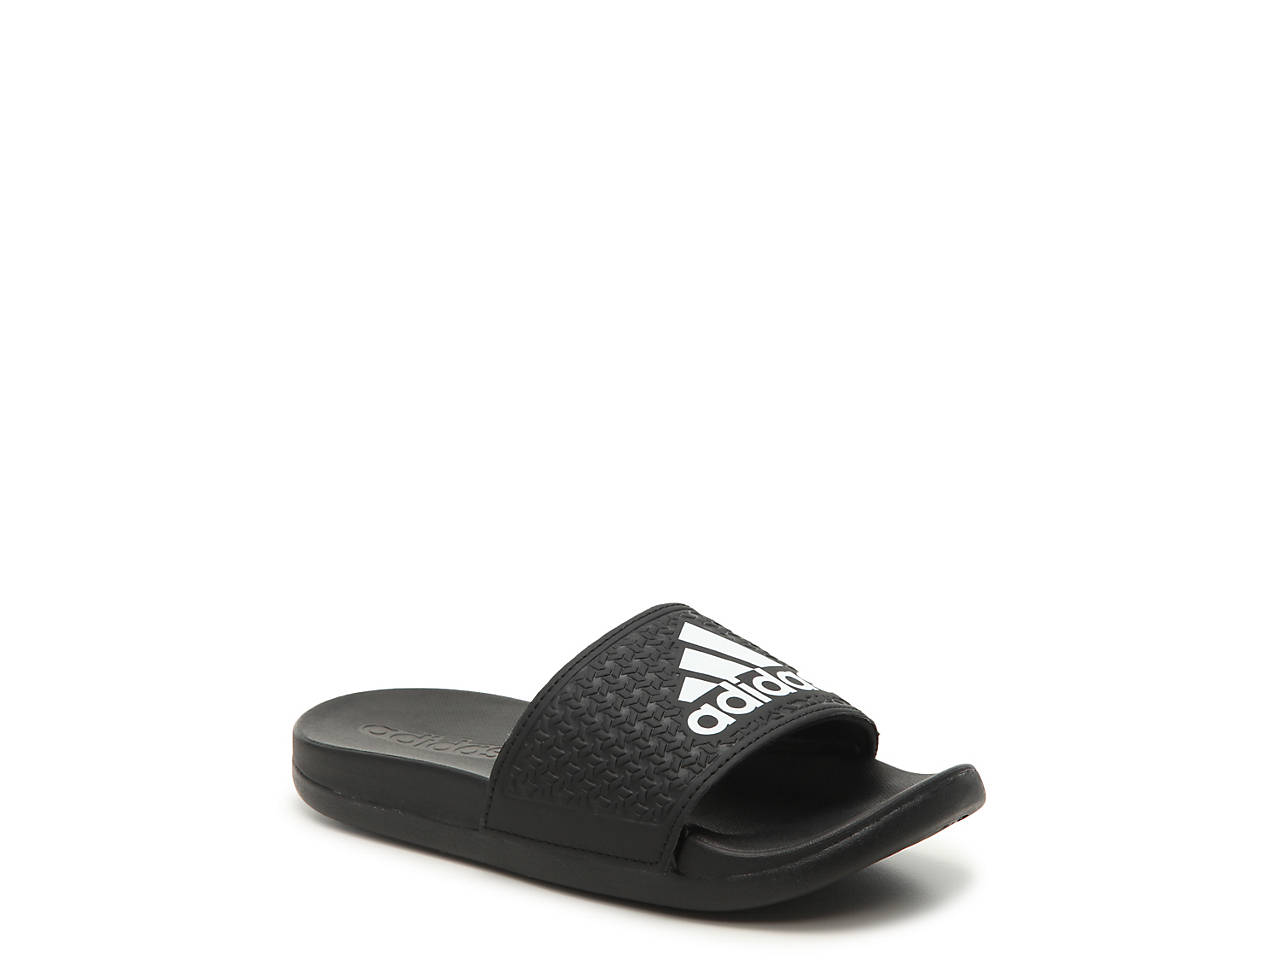 b4ec4765539 adidas Adilette CLF+ Toddler   Youth Slide Sandal Kids Shoes